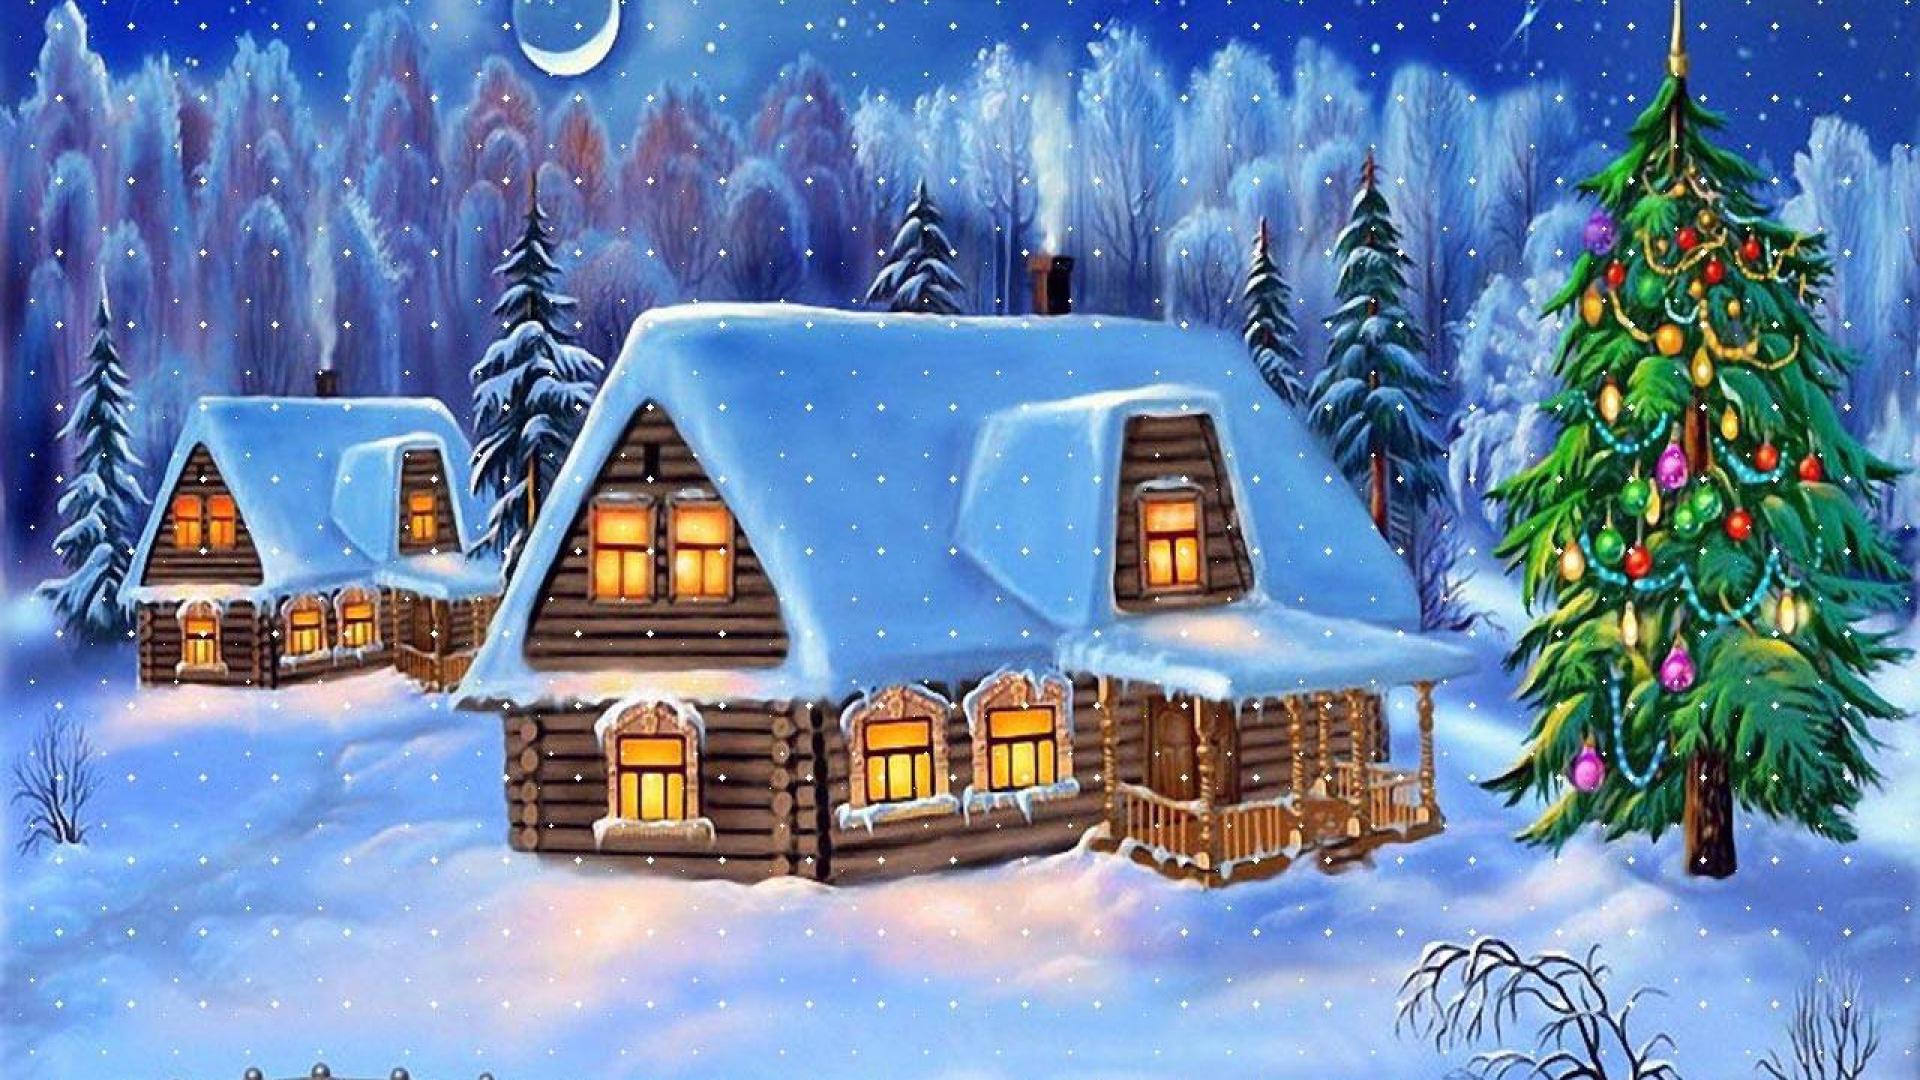 Great Wallpaper Minecraft Christmas - house_fur-tree_snow_winter_new_year_bridge_christmas_card_1000_1920x1080  Gallery_43596.jpg